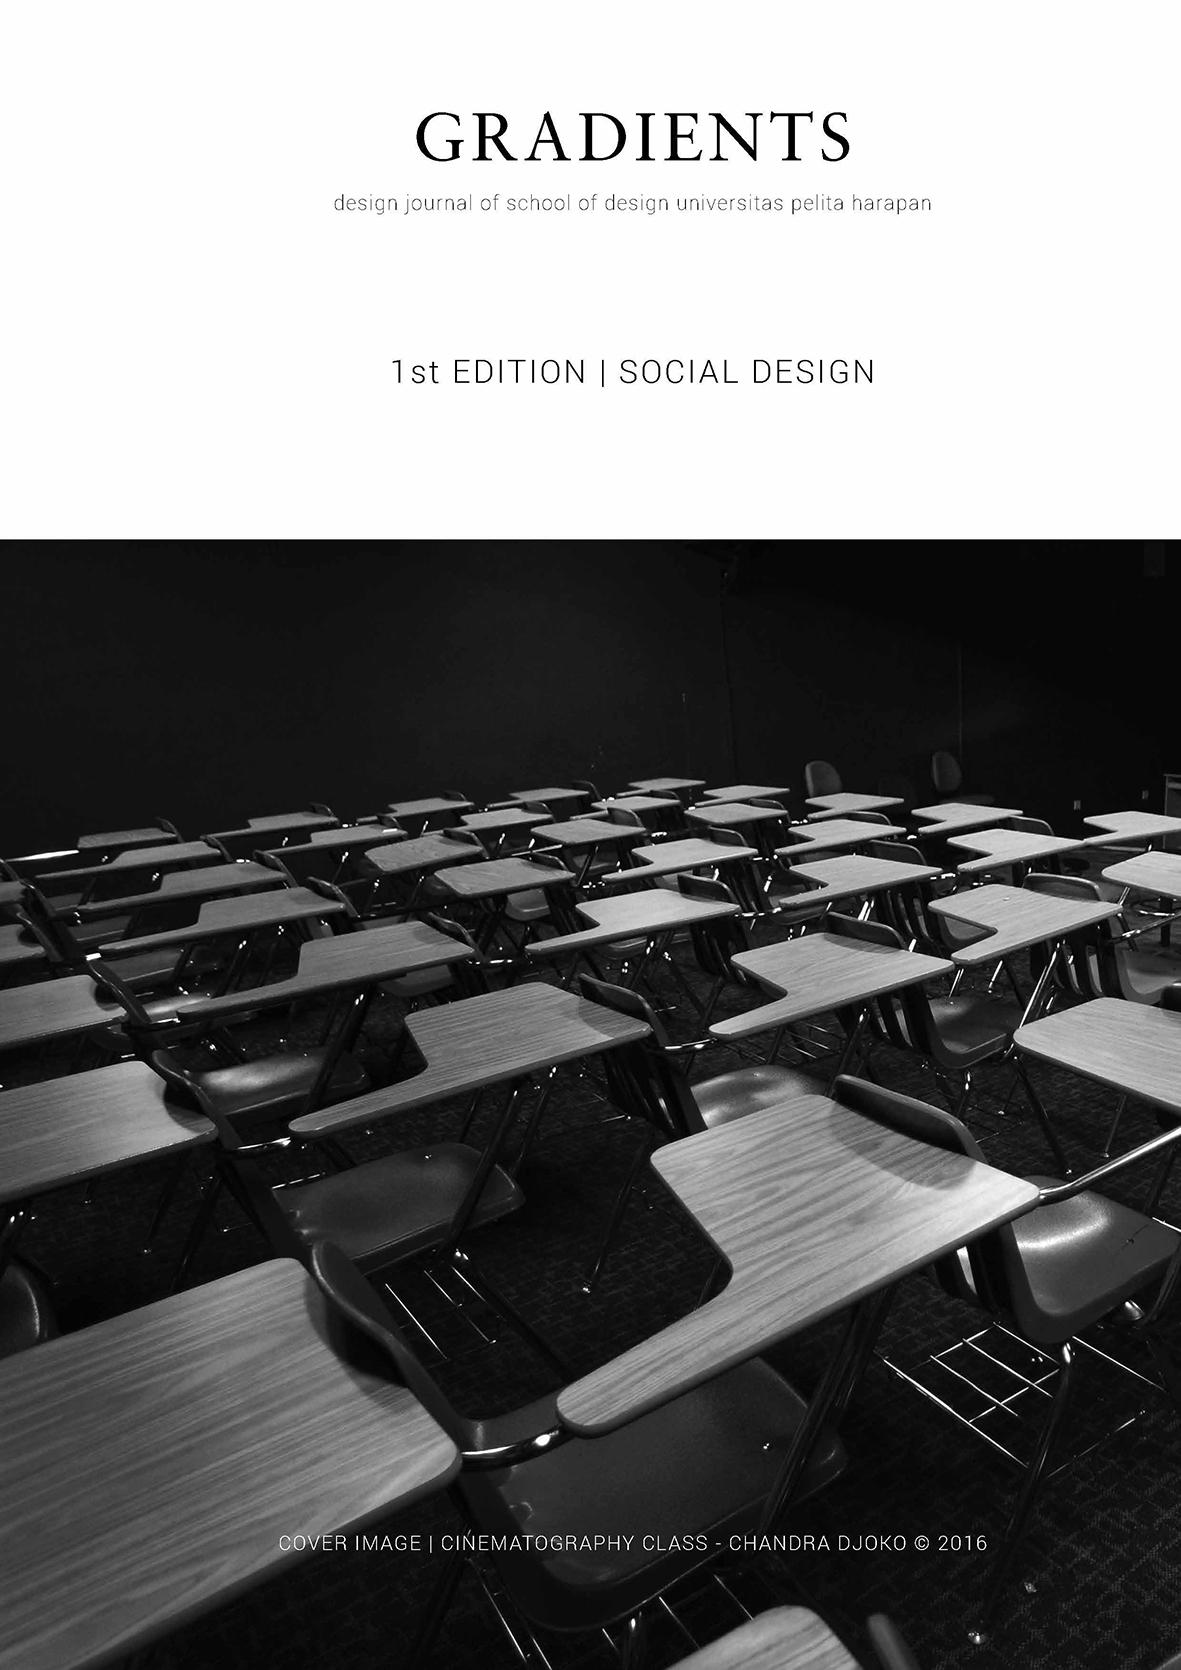 gradients: design journal of school of design universitas pelita harapan